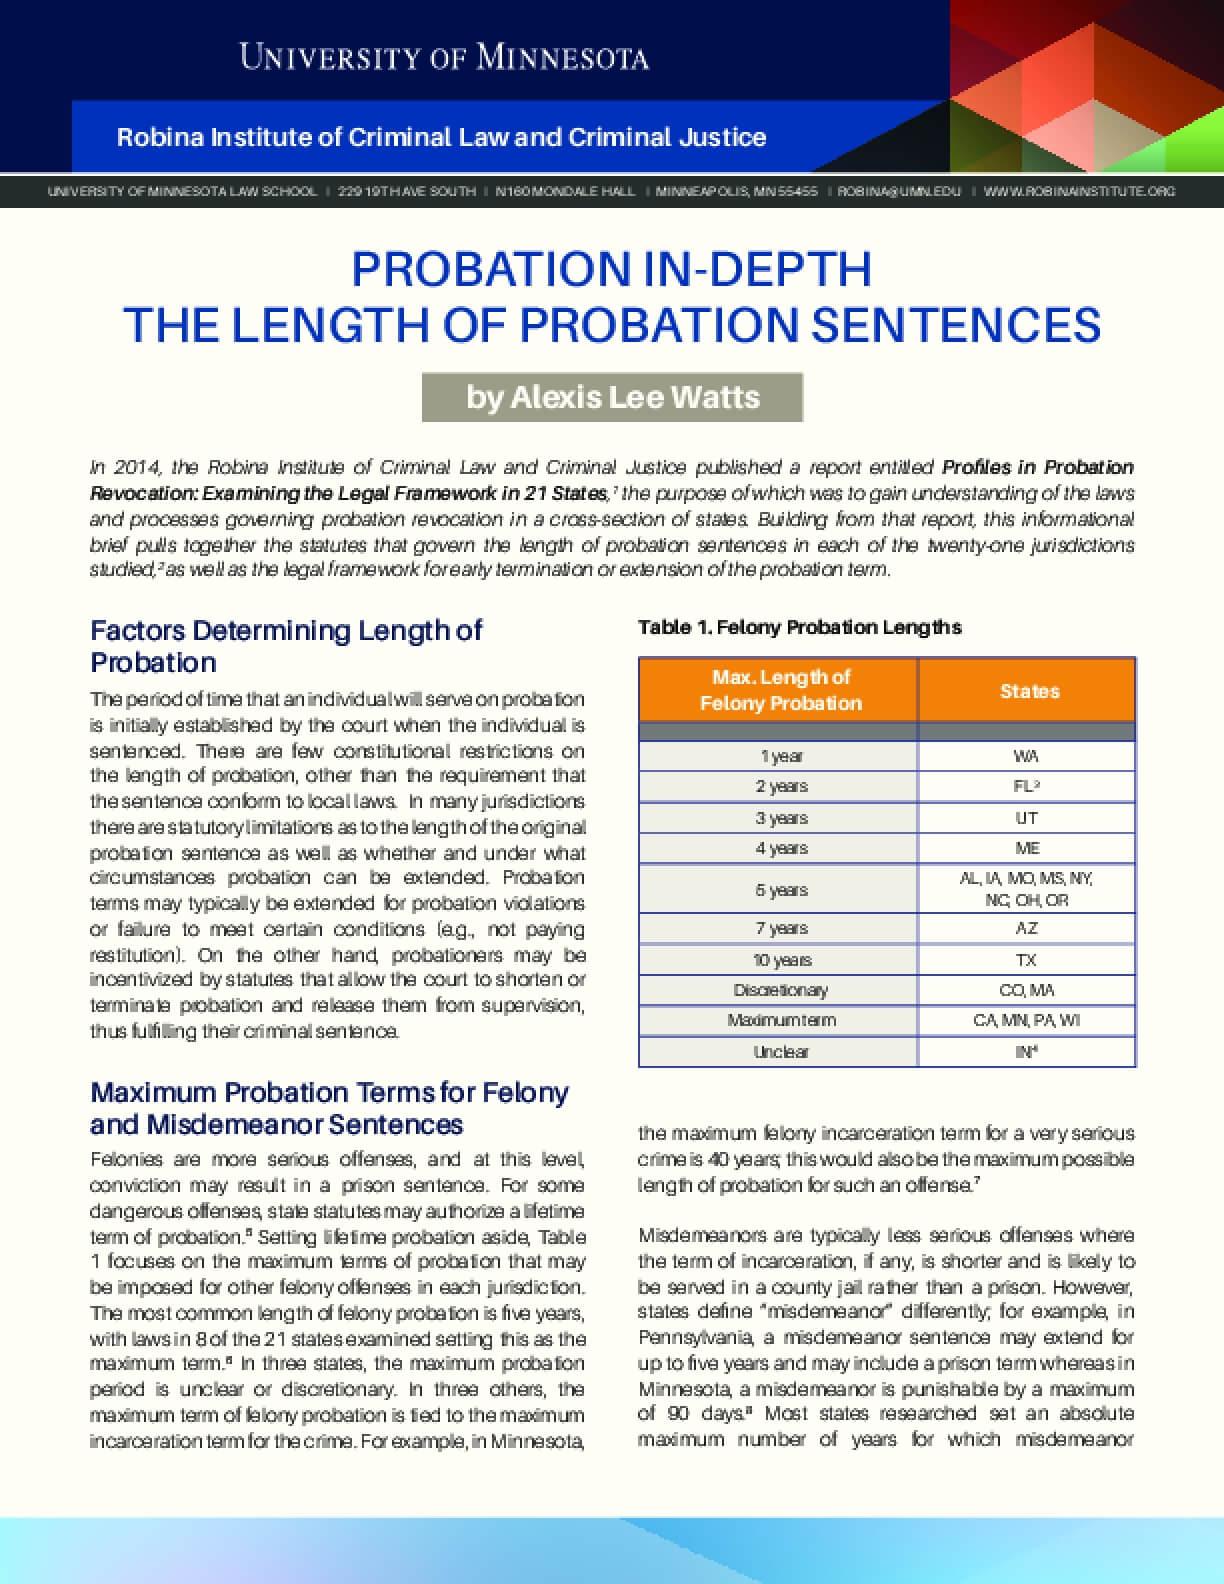 Probation In-Depth: The Length of Probation Sentences